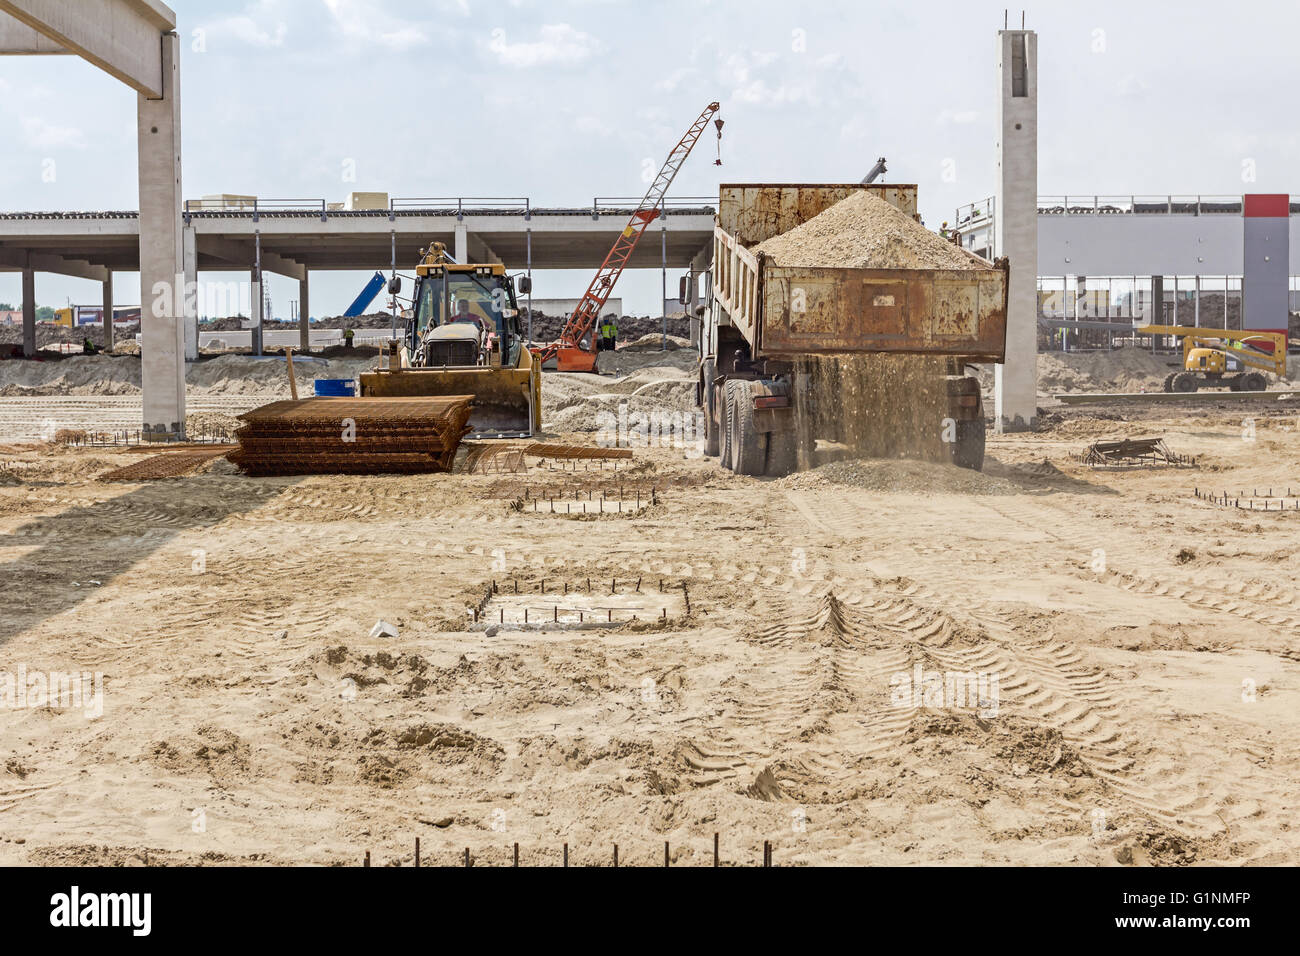 Dumper truck is unloading soil or sand at construction site. Landscape transform into urban area. - Stock Image